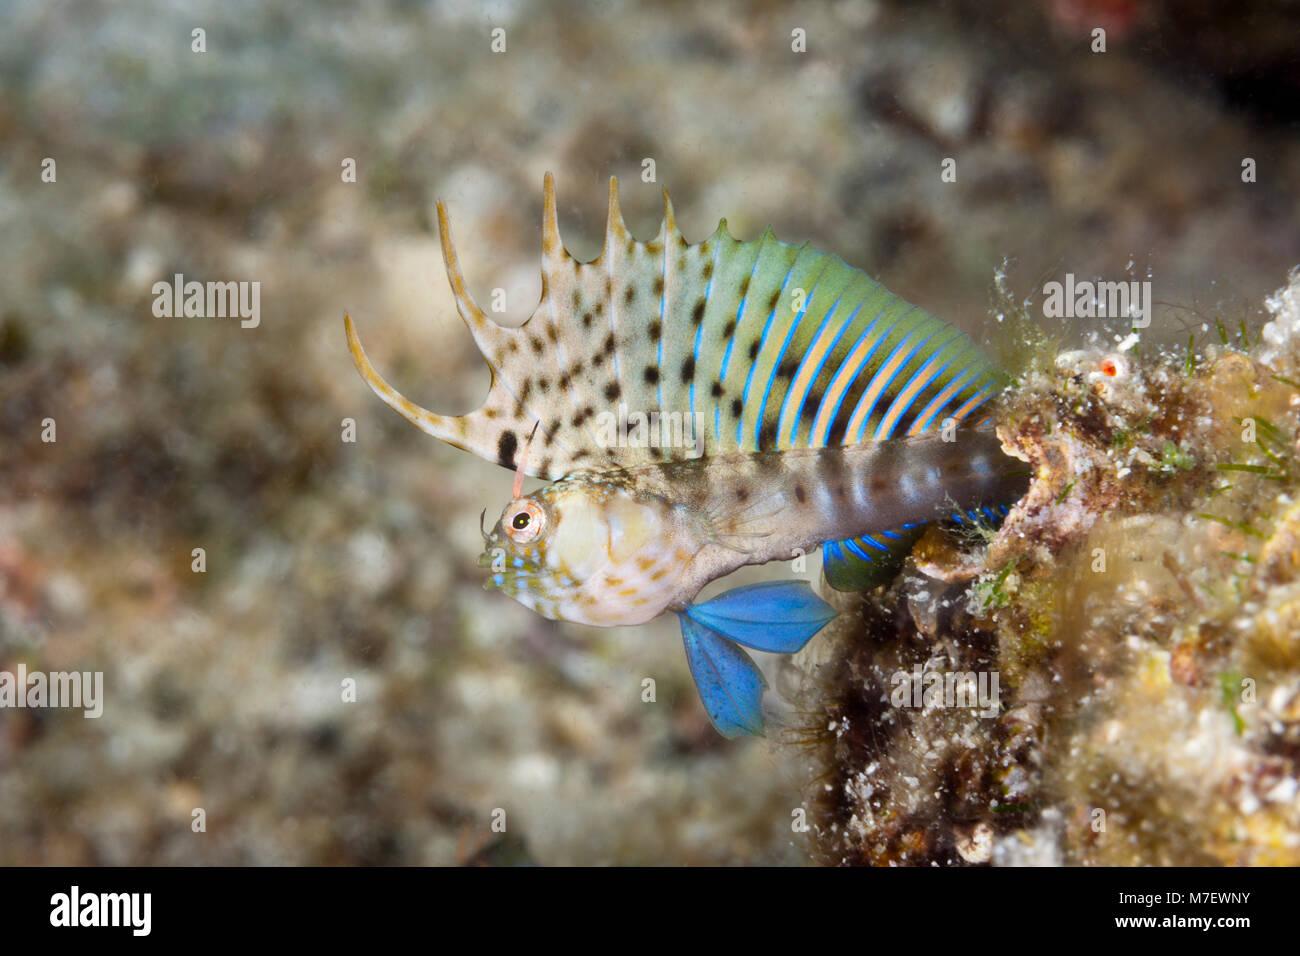 Signal de danger insaisissable Blennies posture, Emblemaria walkeri, La Paz, Baja California Sur, Mexique Photo Stock